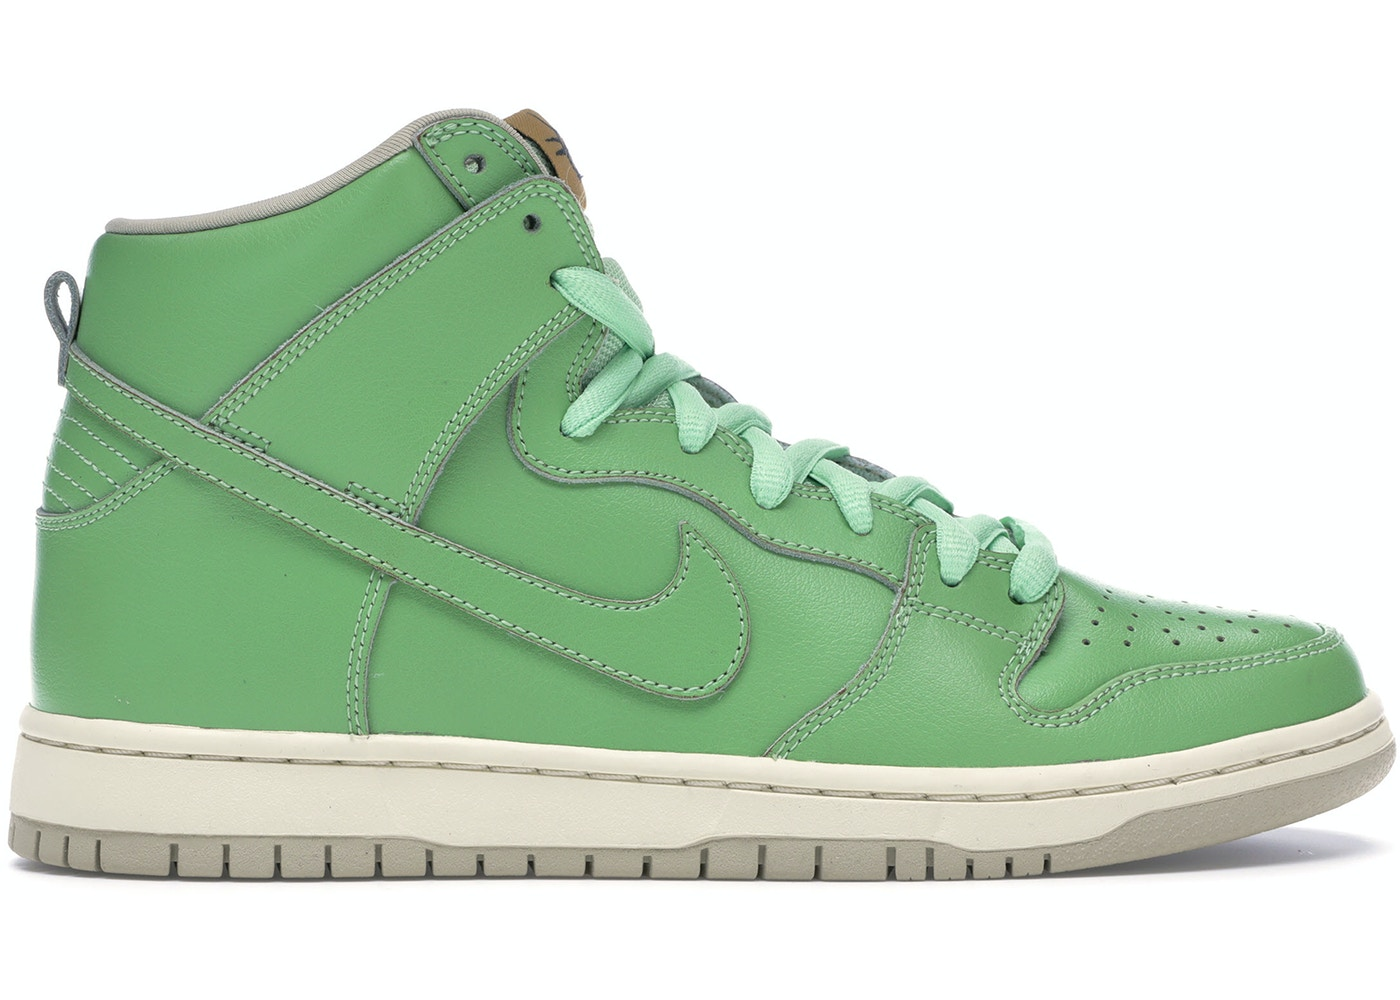 newest 8bf3e 9e91b Nike Dunk SB High Statue of Liberty - 313171-302